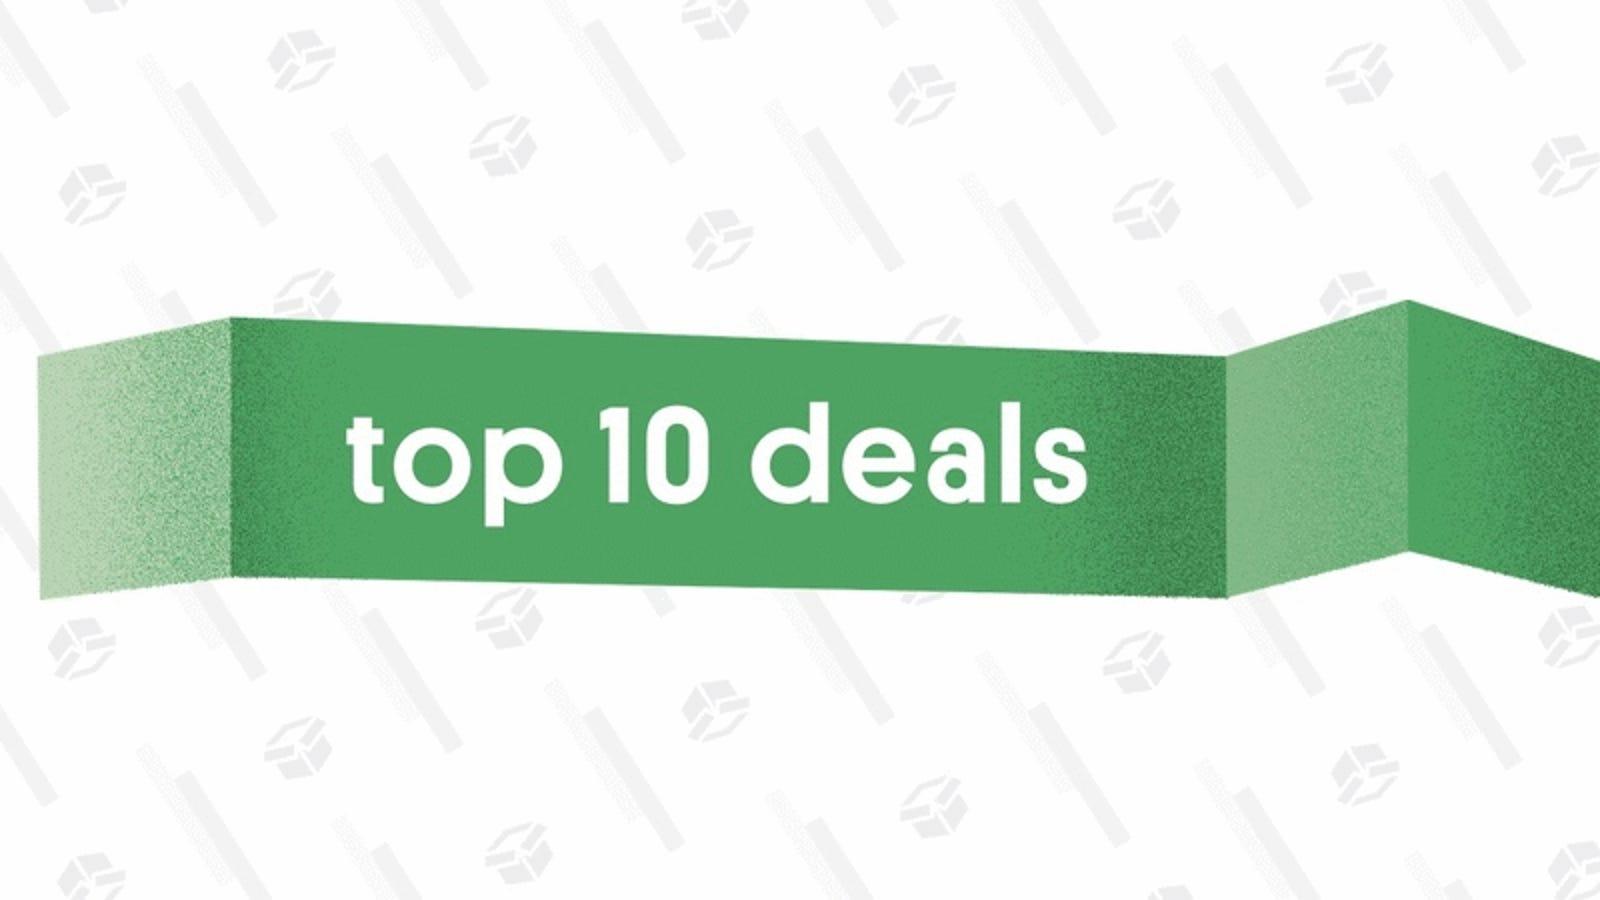 The 10 Best Deals of September 24, 2018